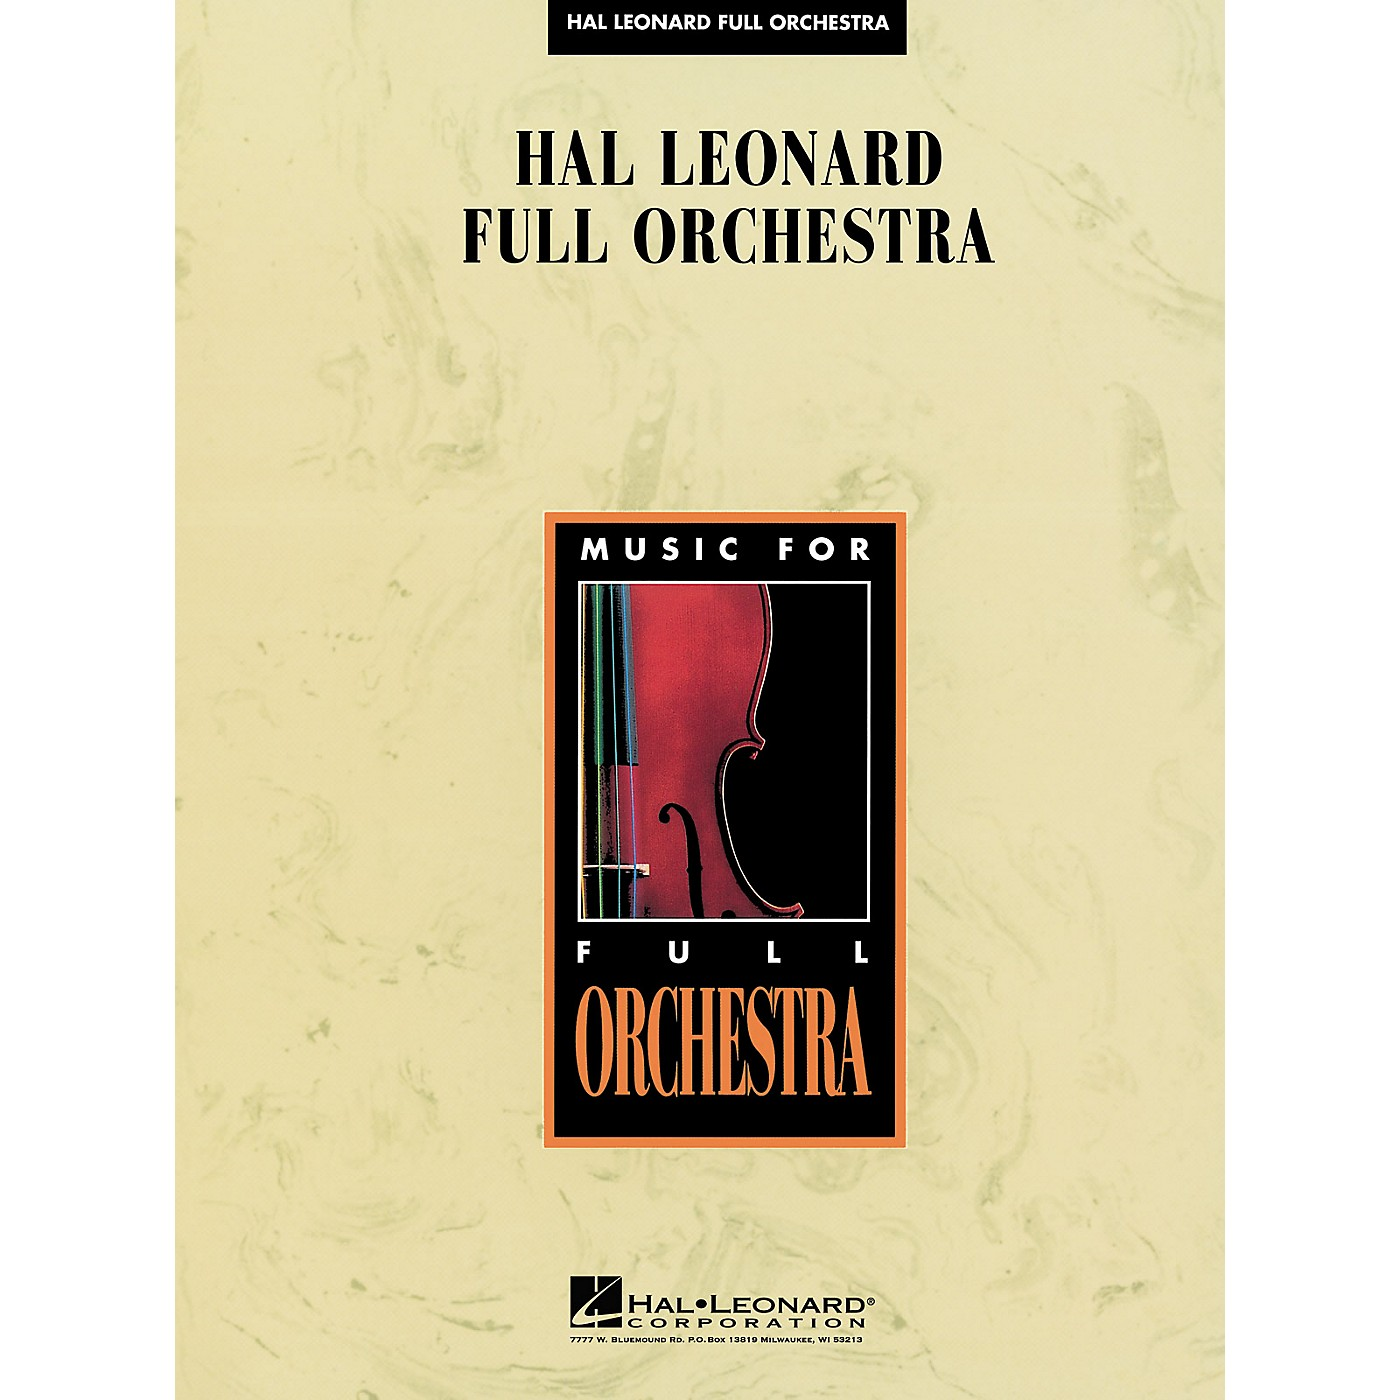 Ricordi Concerto in A Minor for Violin Strings and Basso Continuo RV356 Orchestra by Vivaldi thumbnail